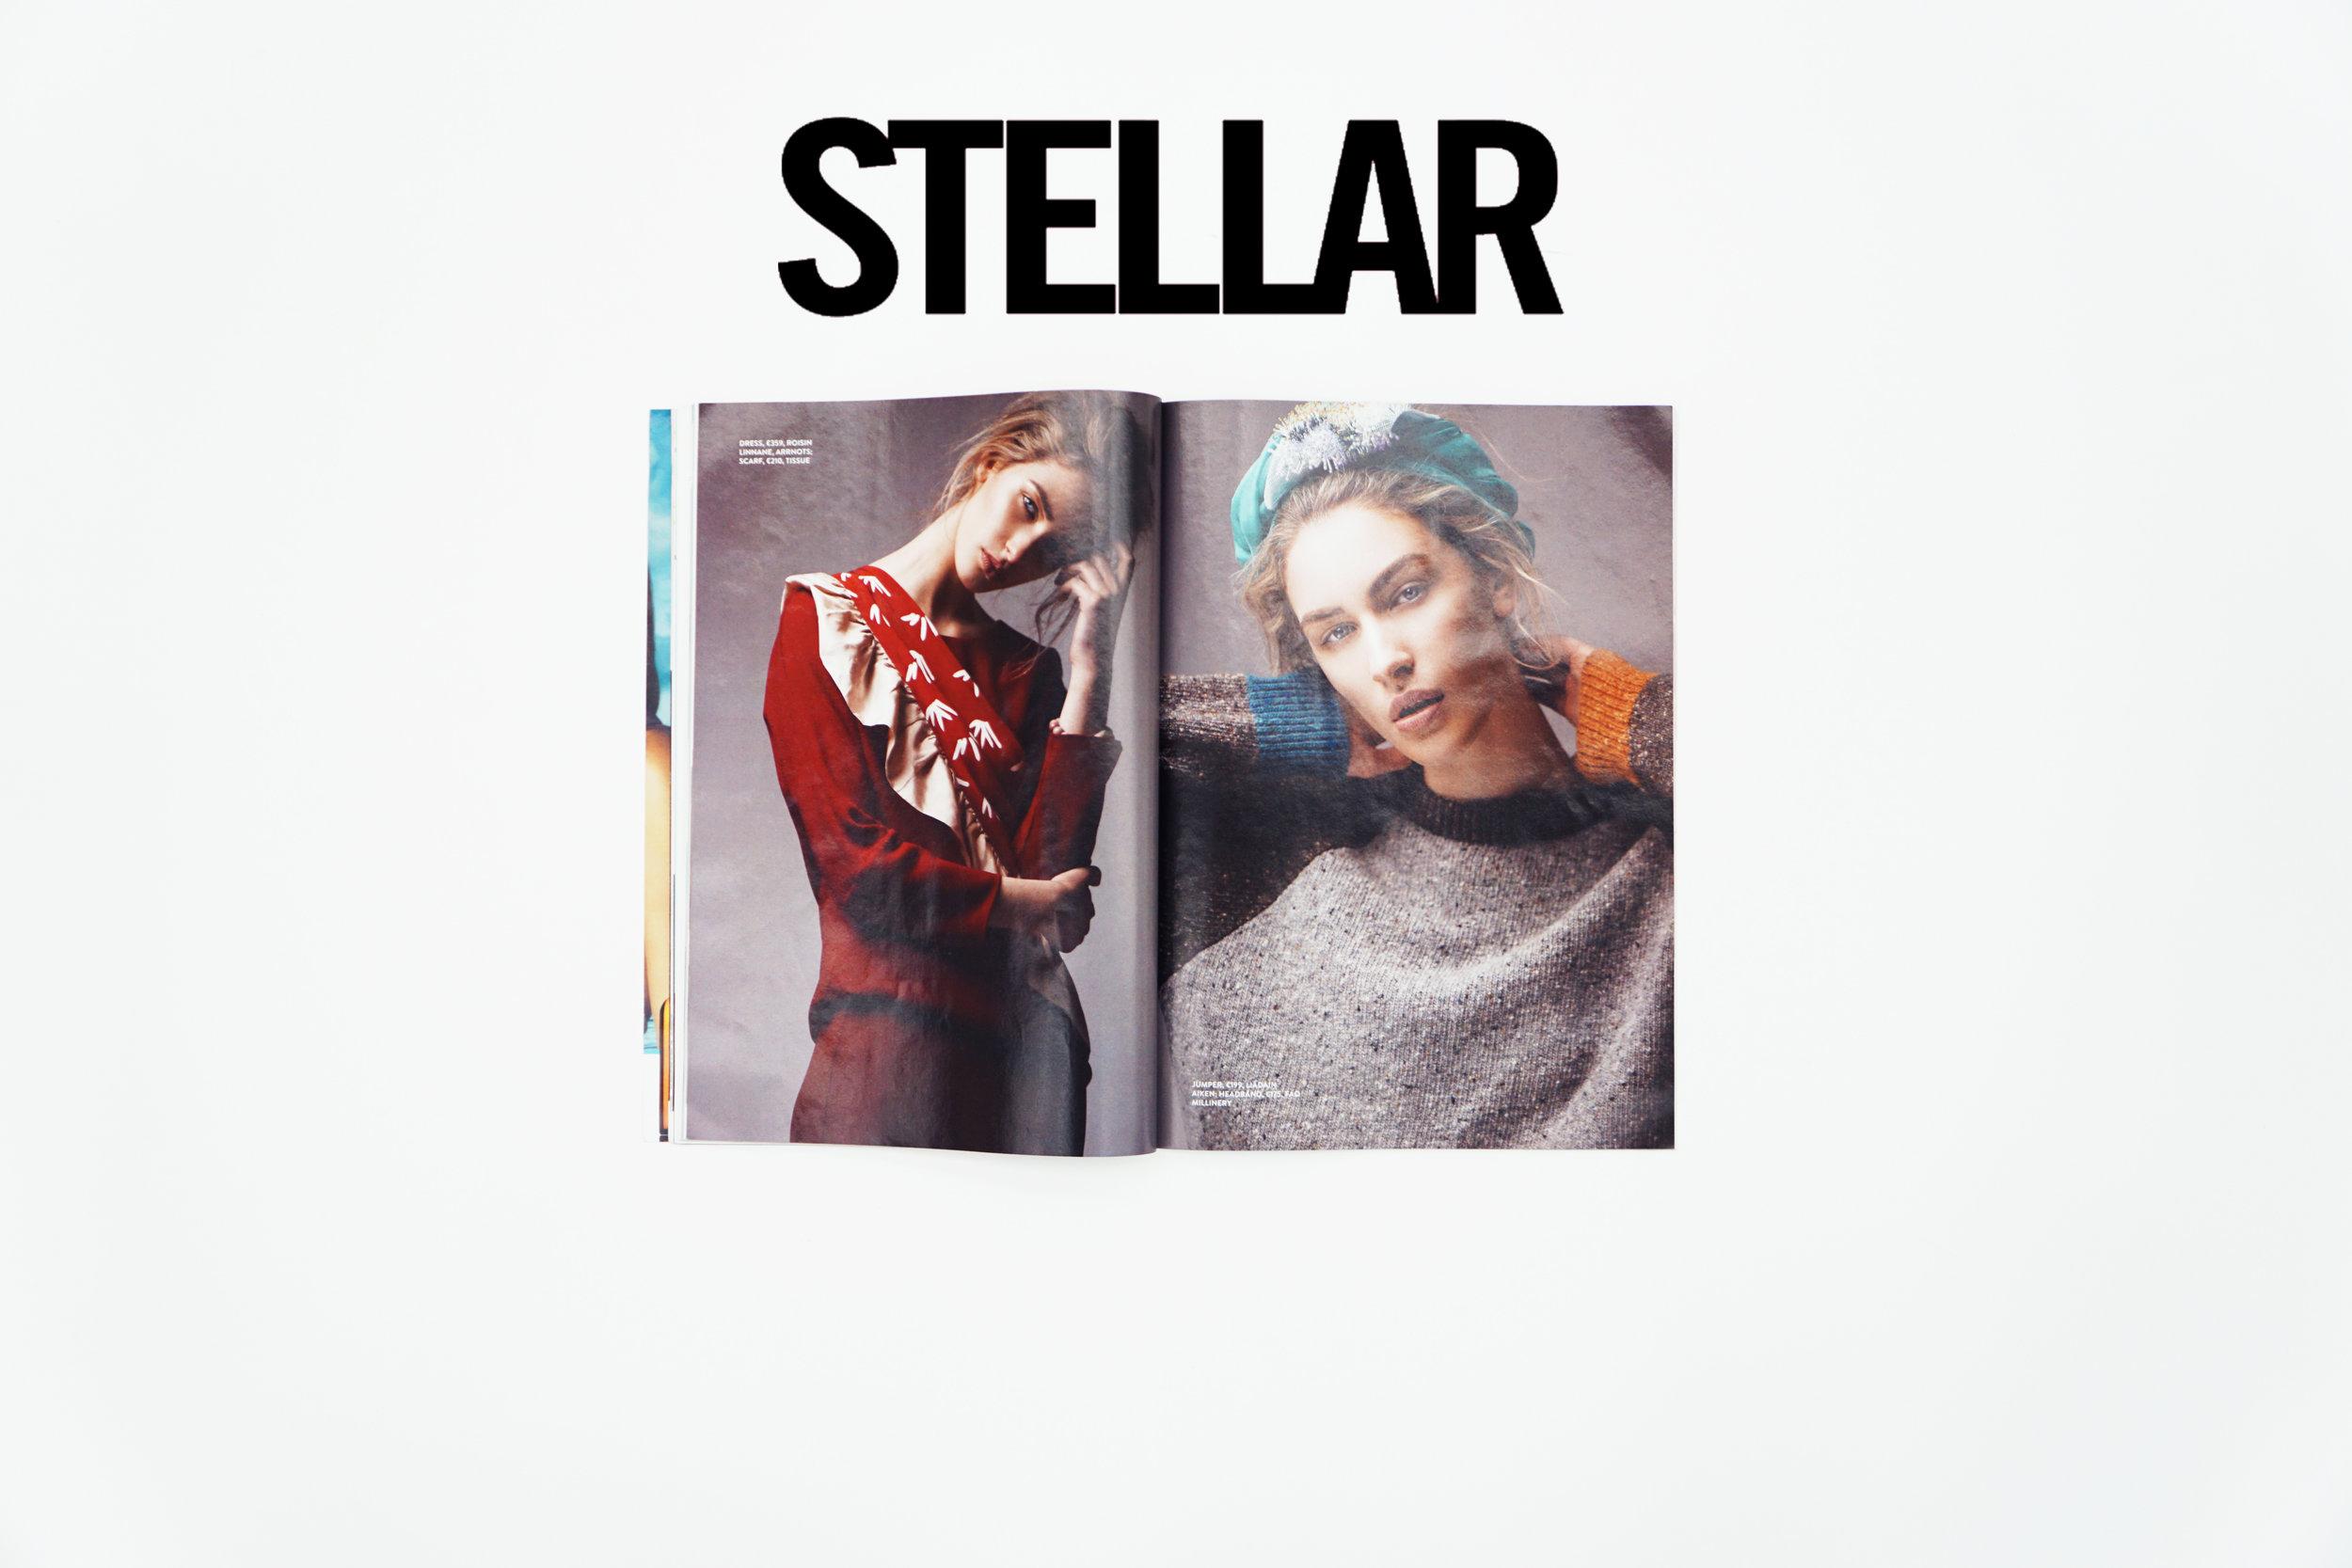 stellar 1.jpg